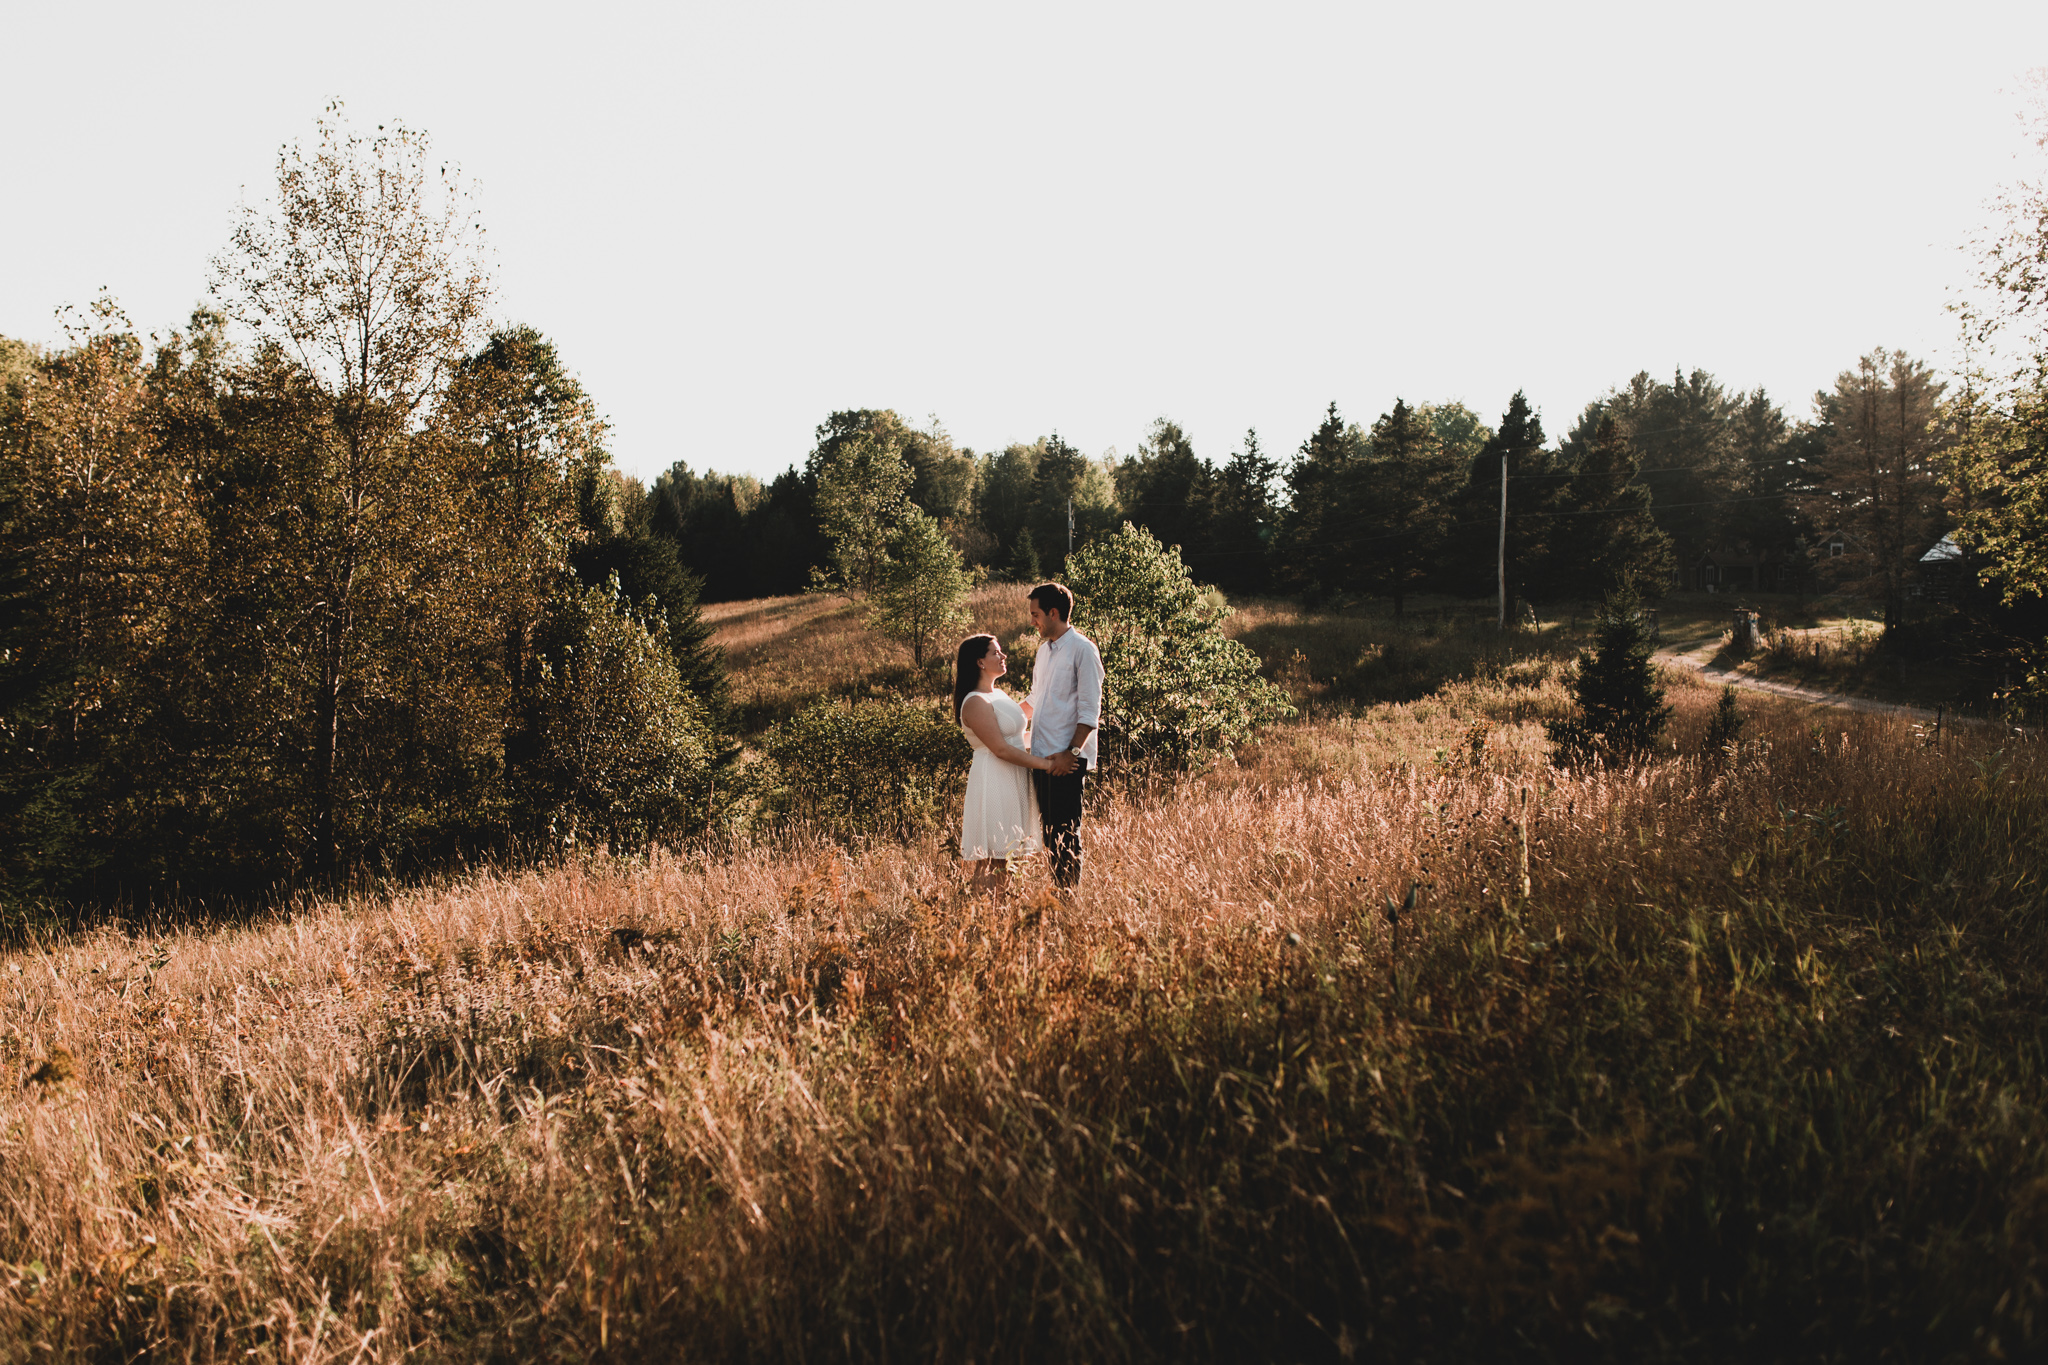 029-WEB-Jonathan-Kuhn-Photography-Rebecca-Emil-Engagement-4553.jpg